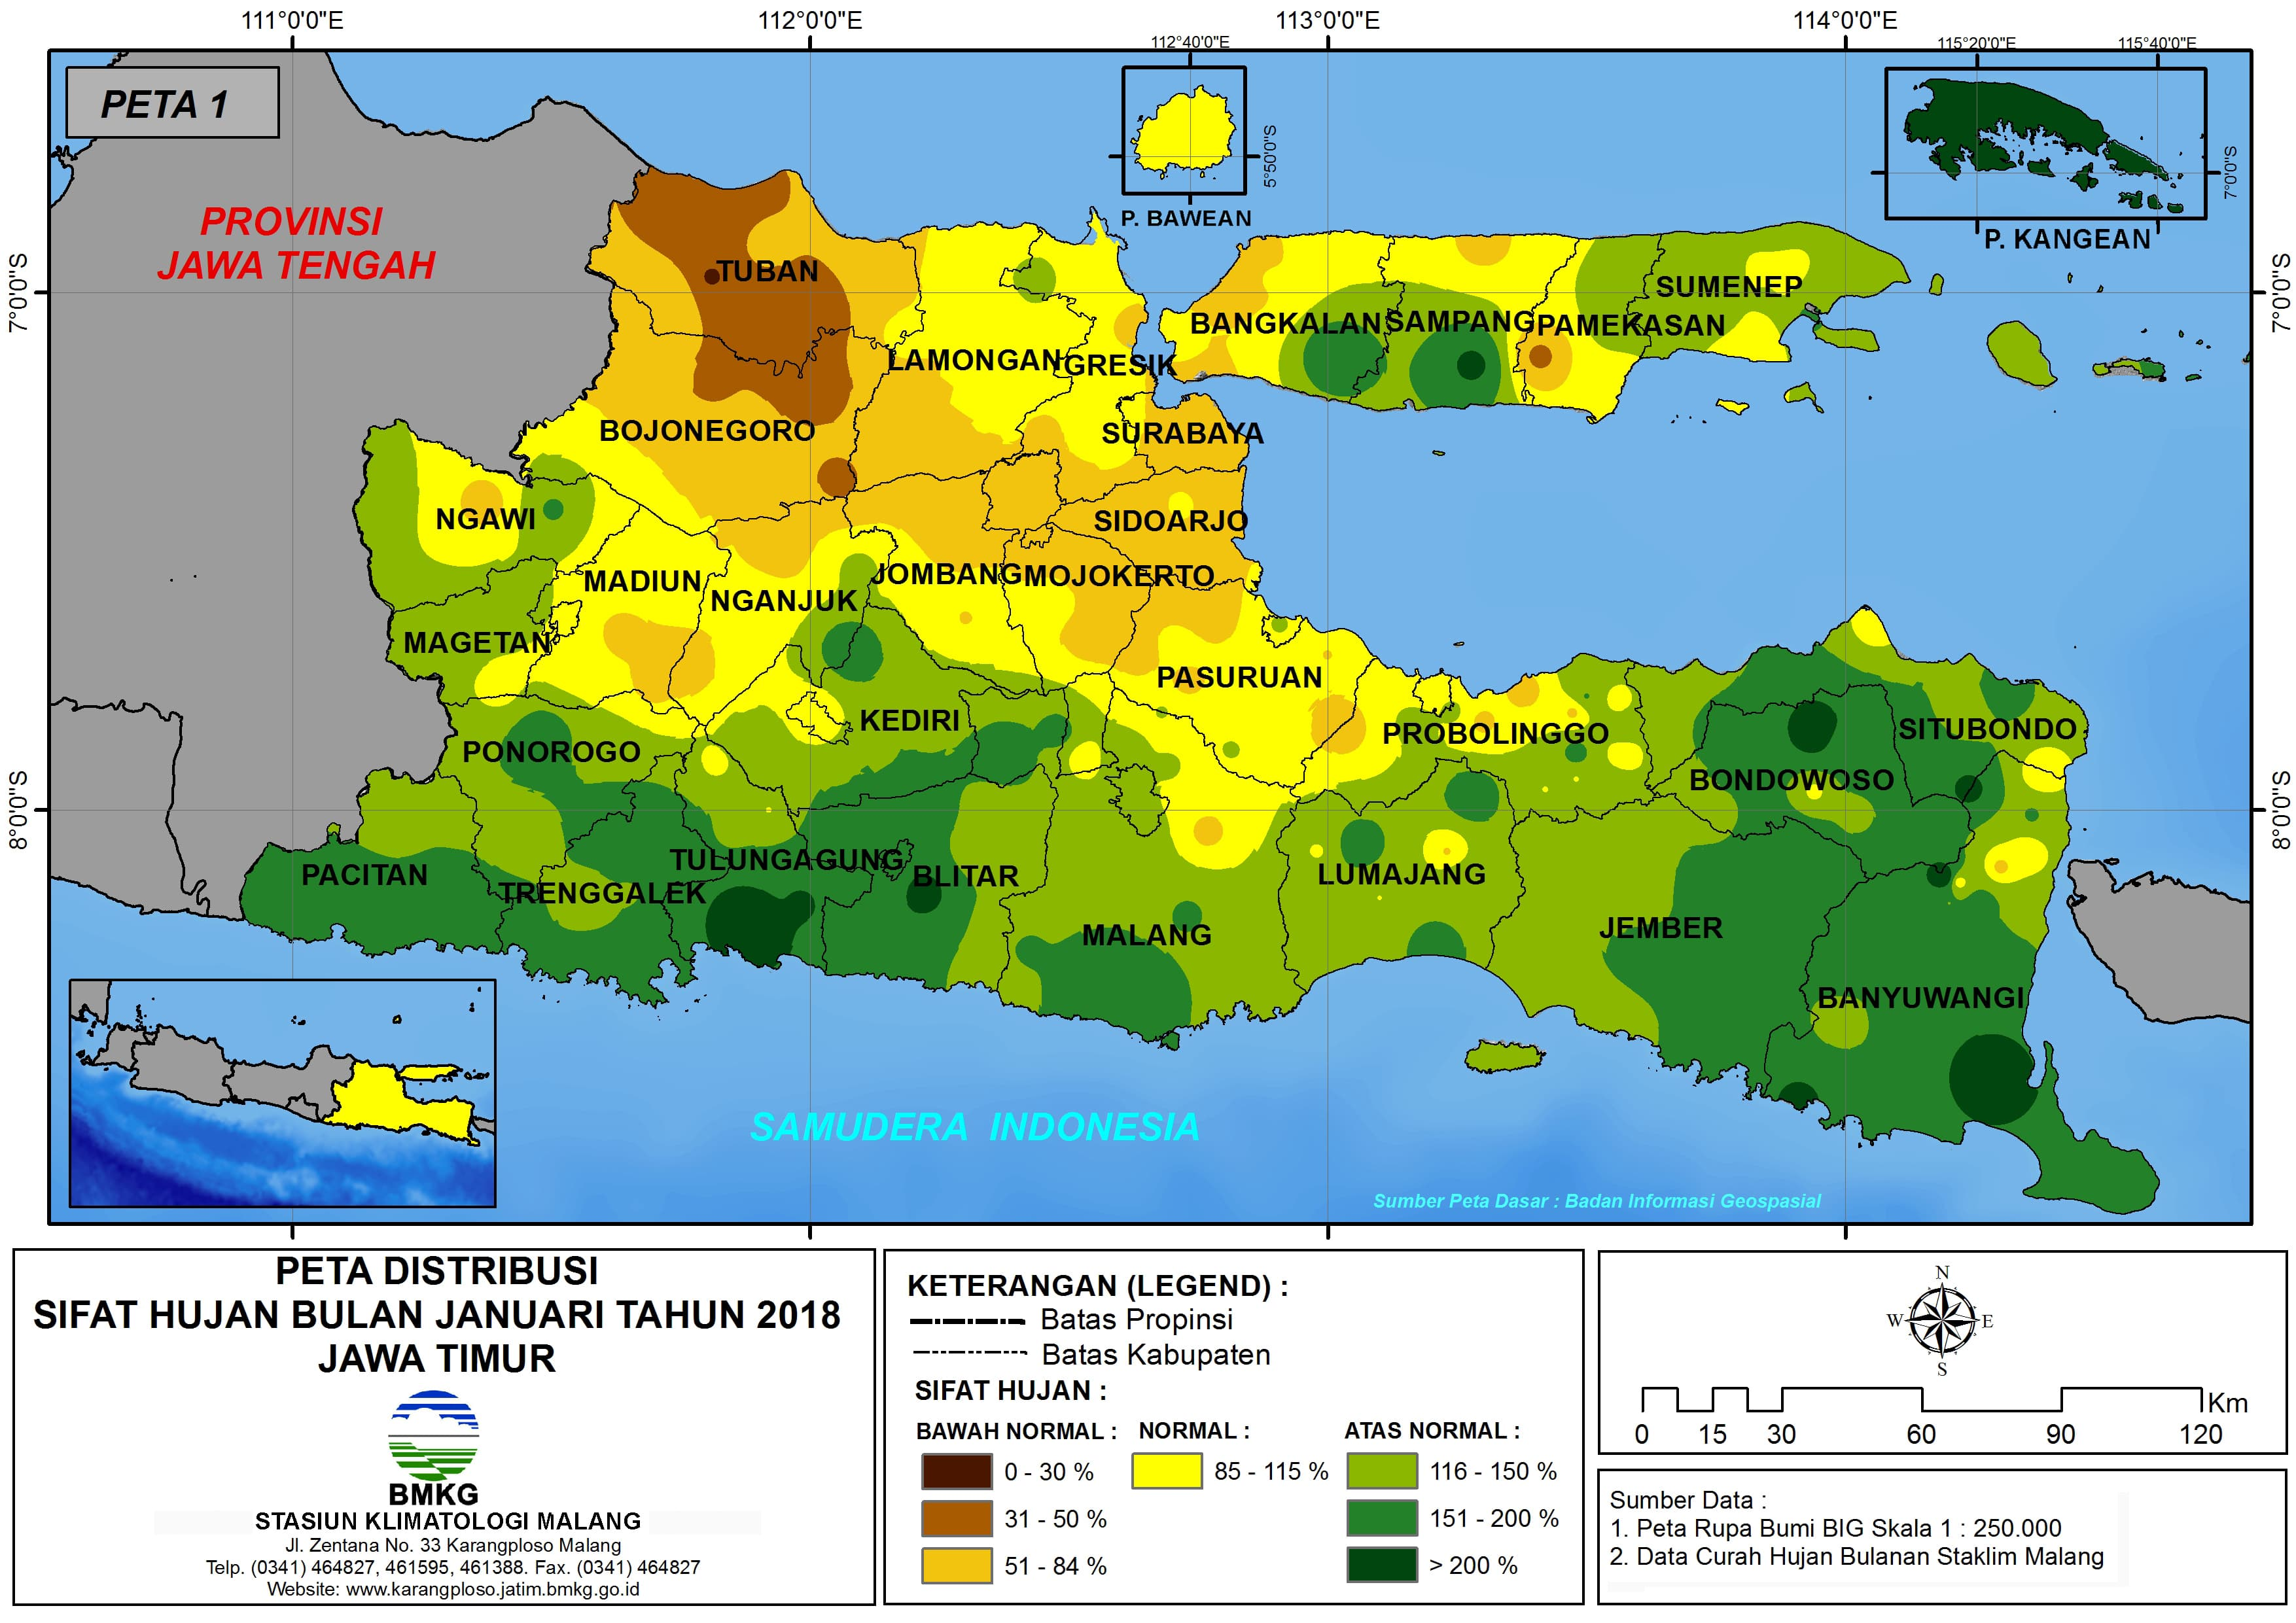 Analisis Distribusi Sifat Hujan Bulan Januari Tahun 2018 di Propinsi Jawa Timur